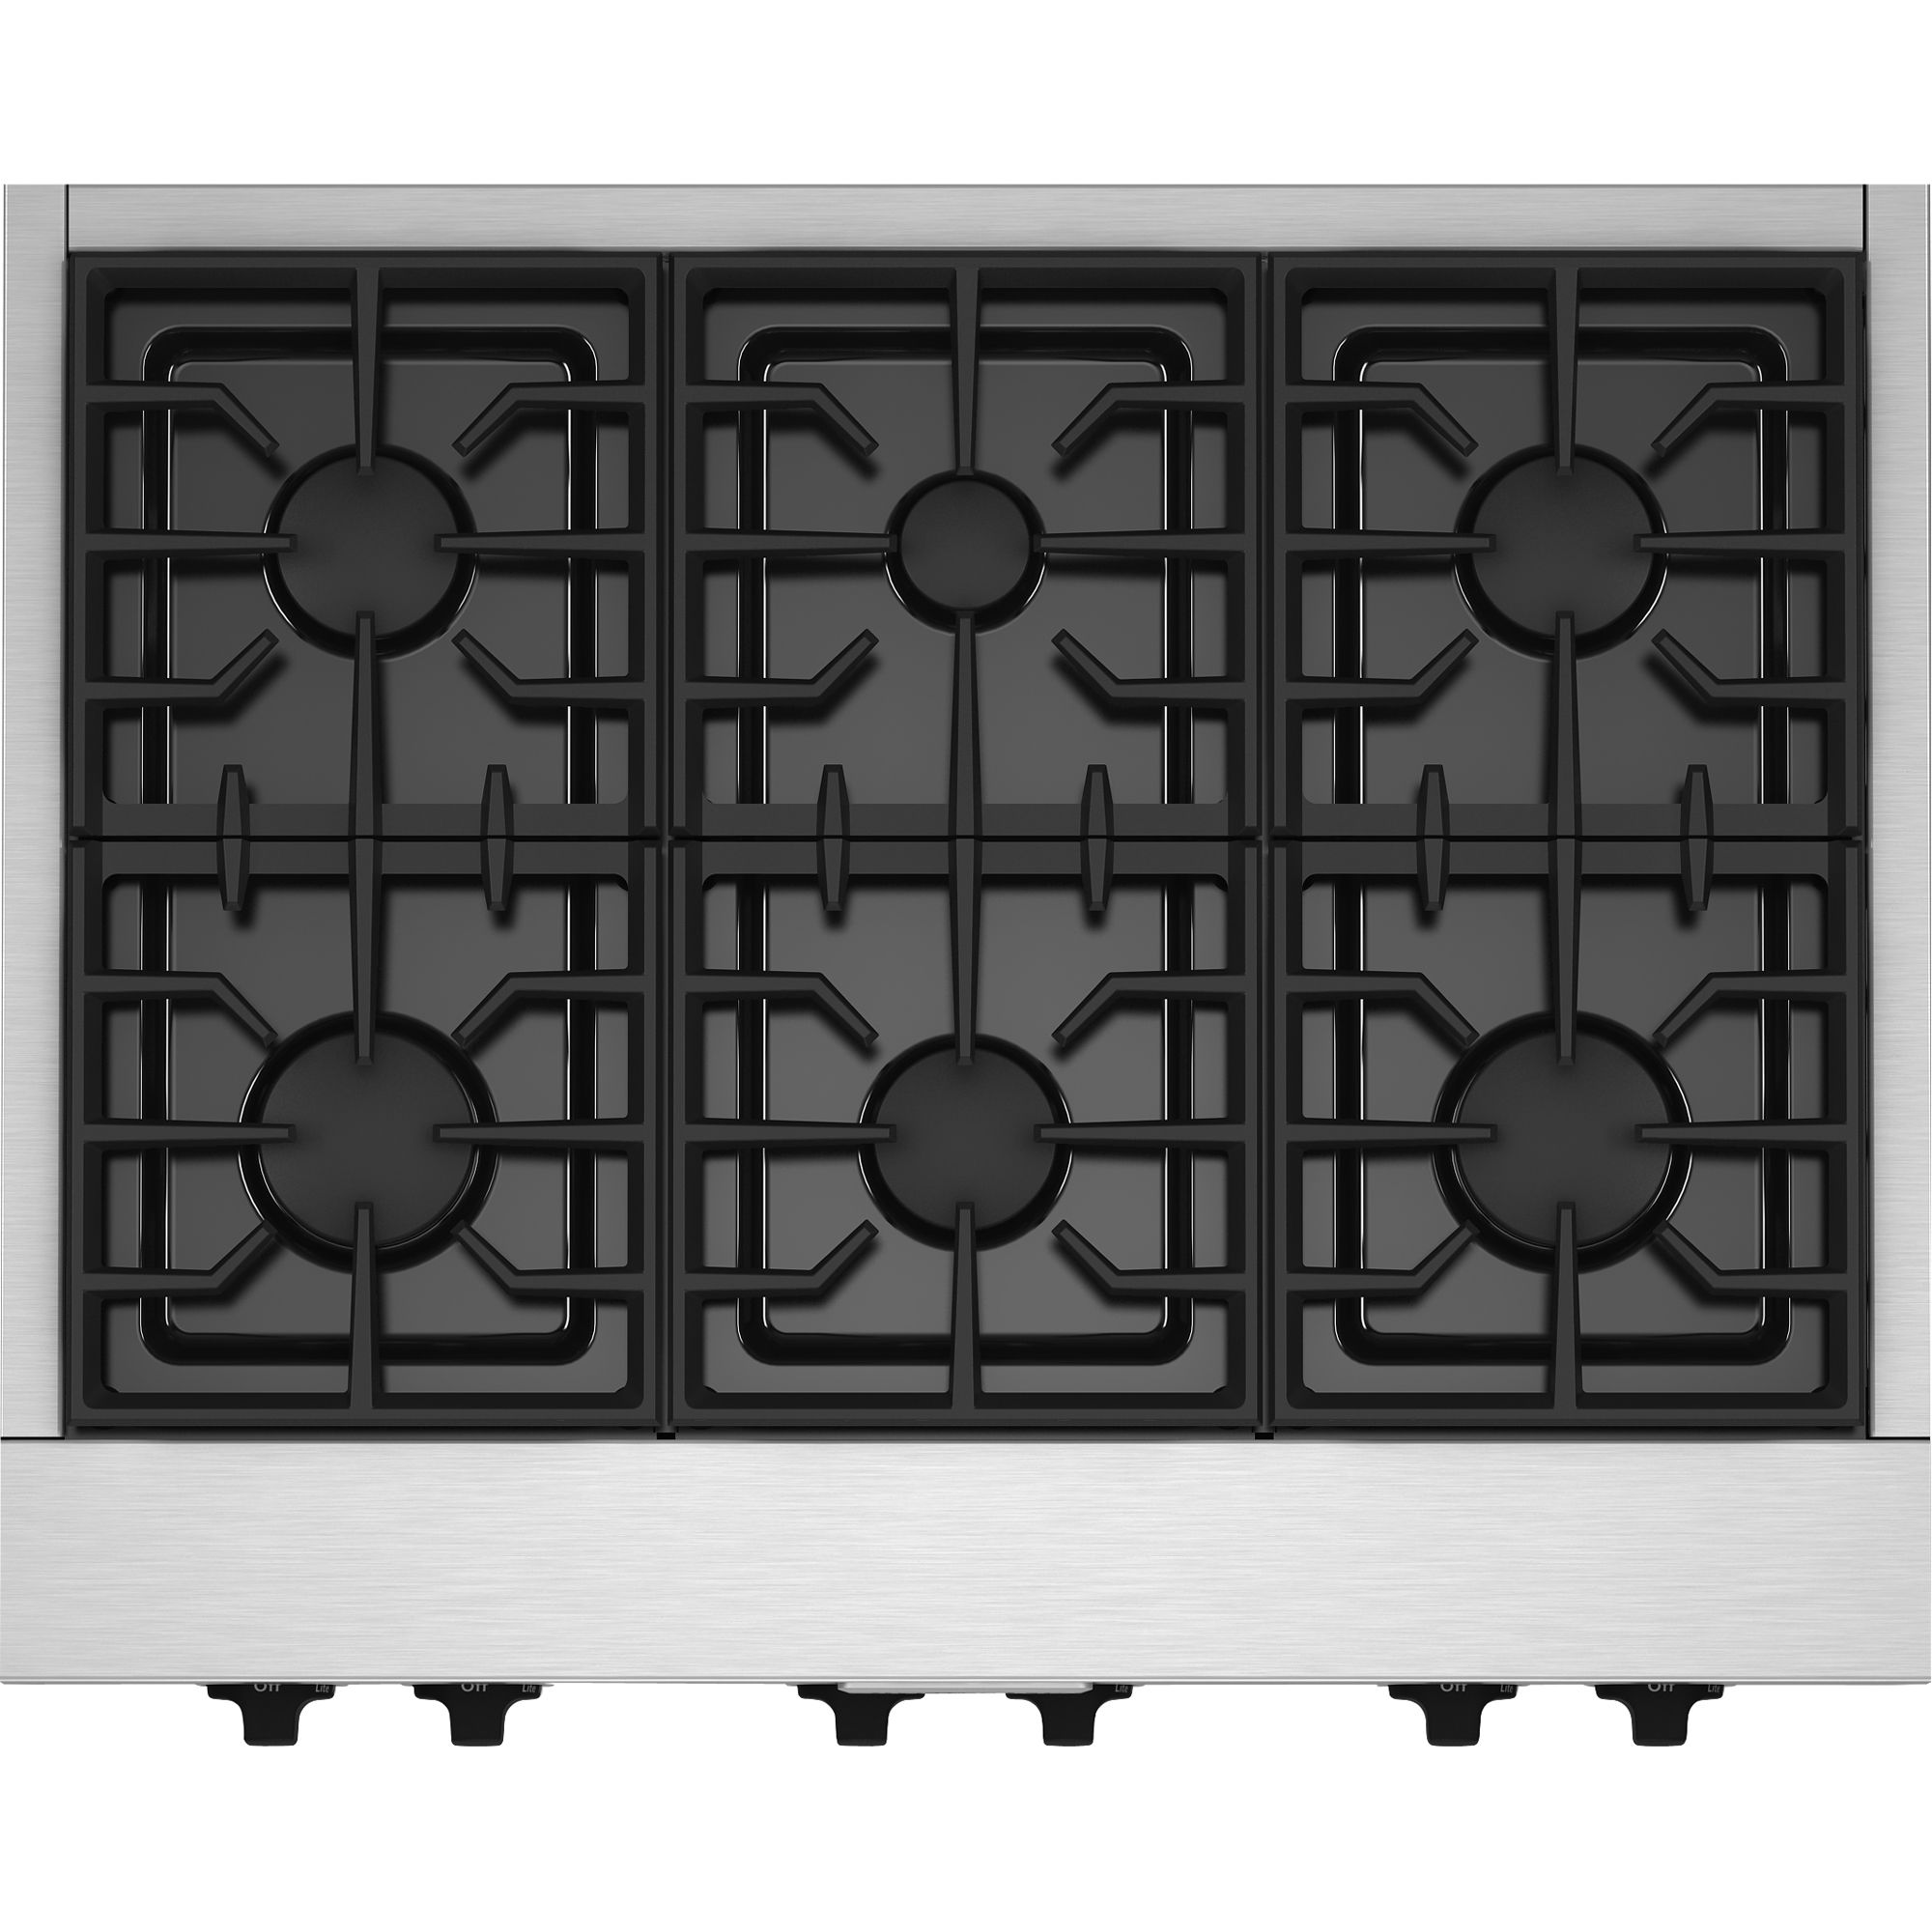 "KitchenAid KGCU467VSS Pro-Style® 36"" Gas Cooktop"